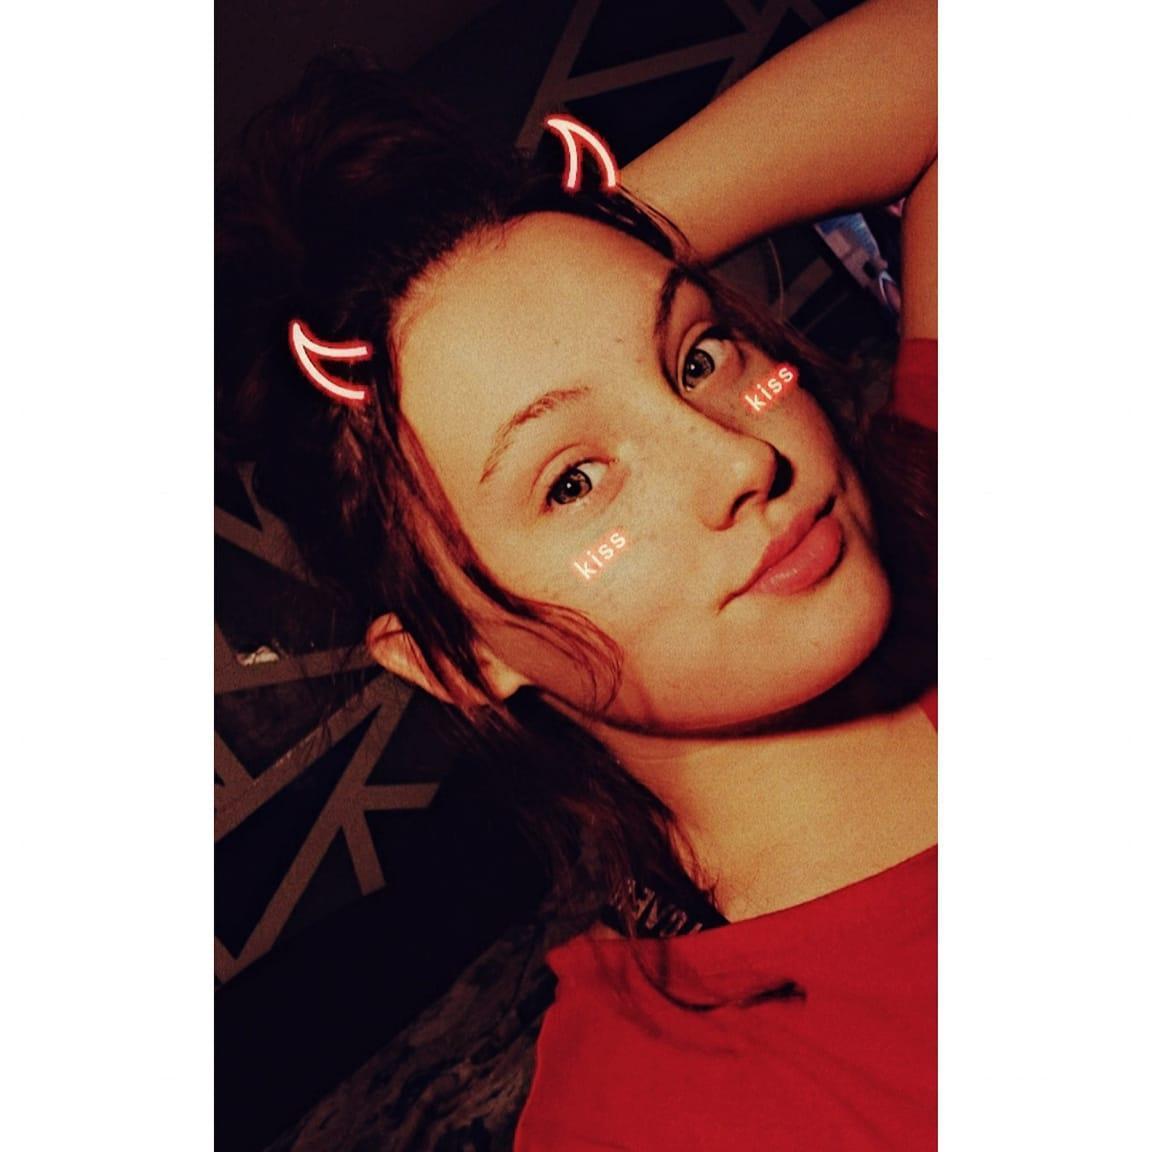 Evelina meow